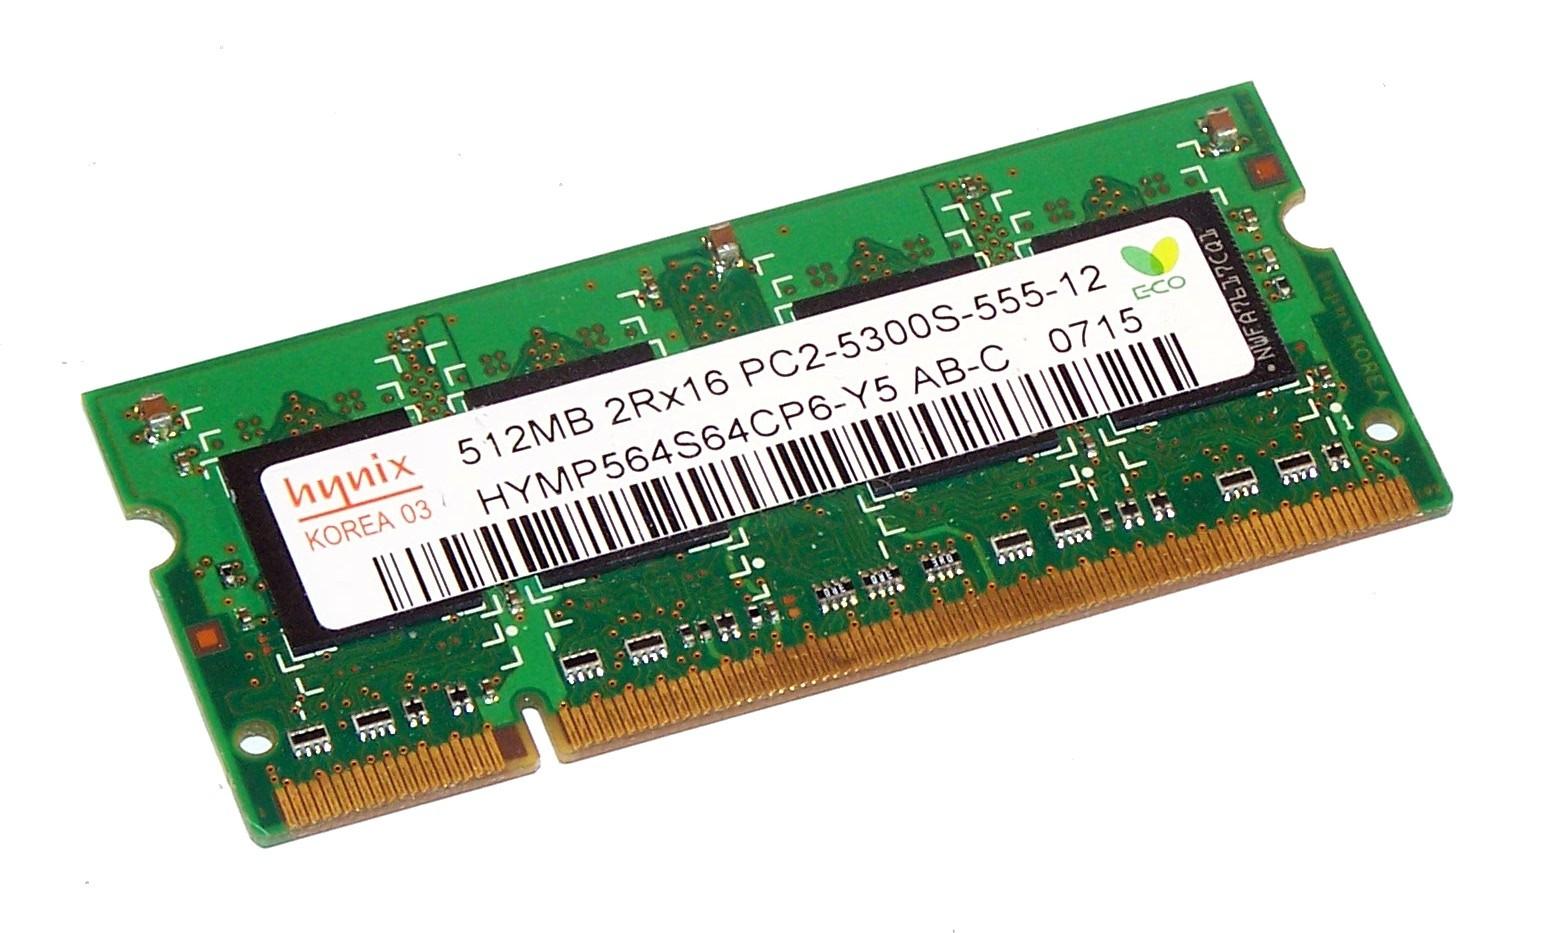 Hynix - HYMP564S64CP6-Y5 - 512 MB - DDR2 - 667 MHZ - PC2 5300S